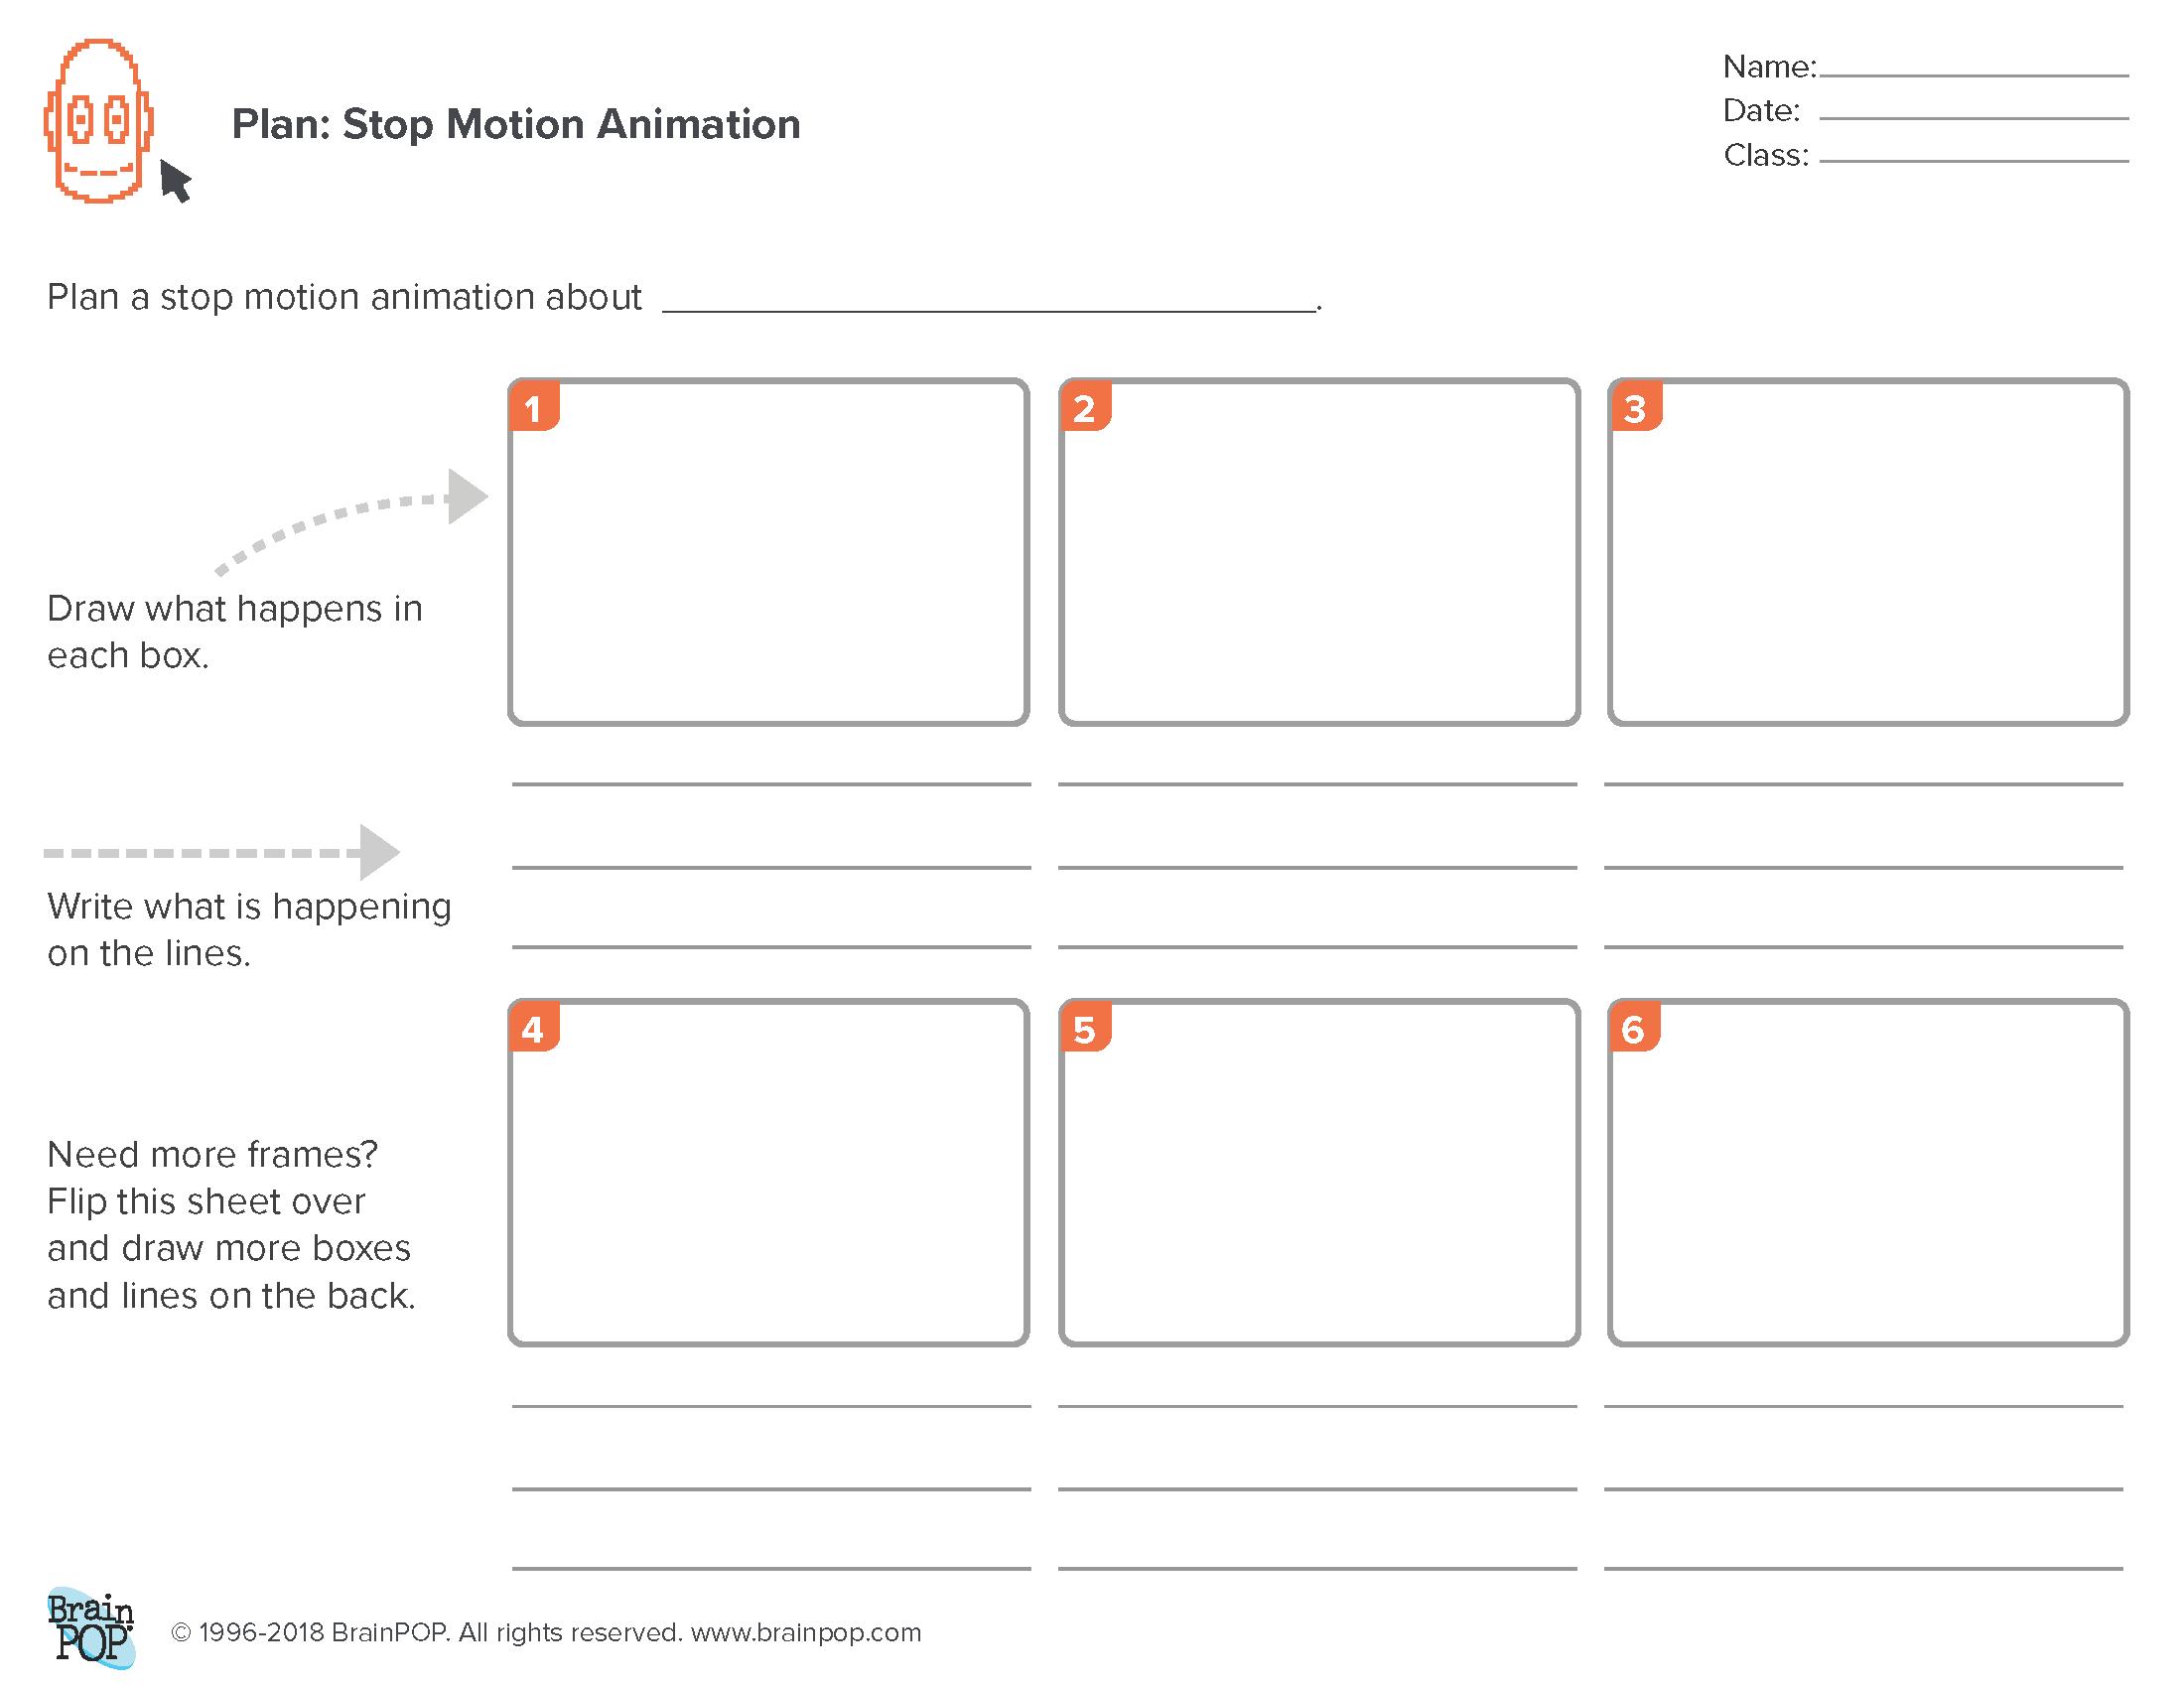 Planning Sheet: Stop Motion